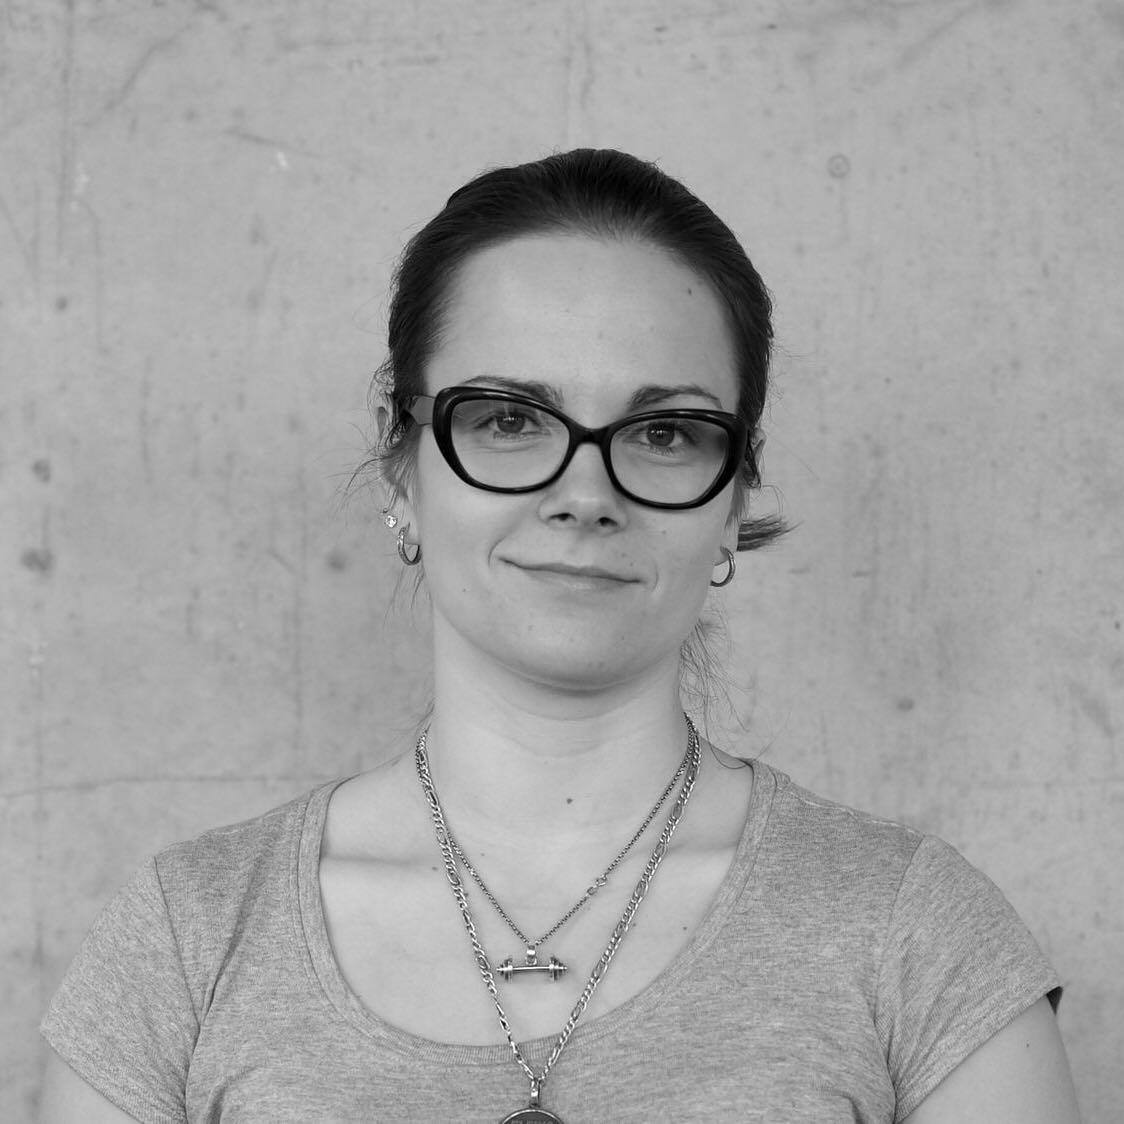 Iveta Jurcikova